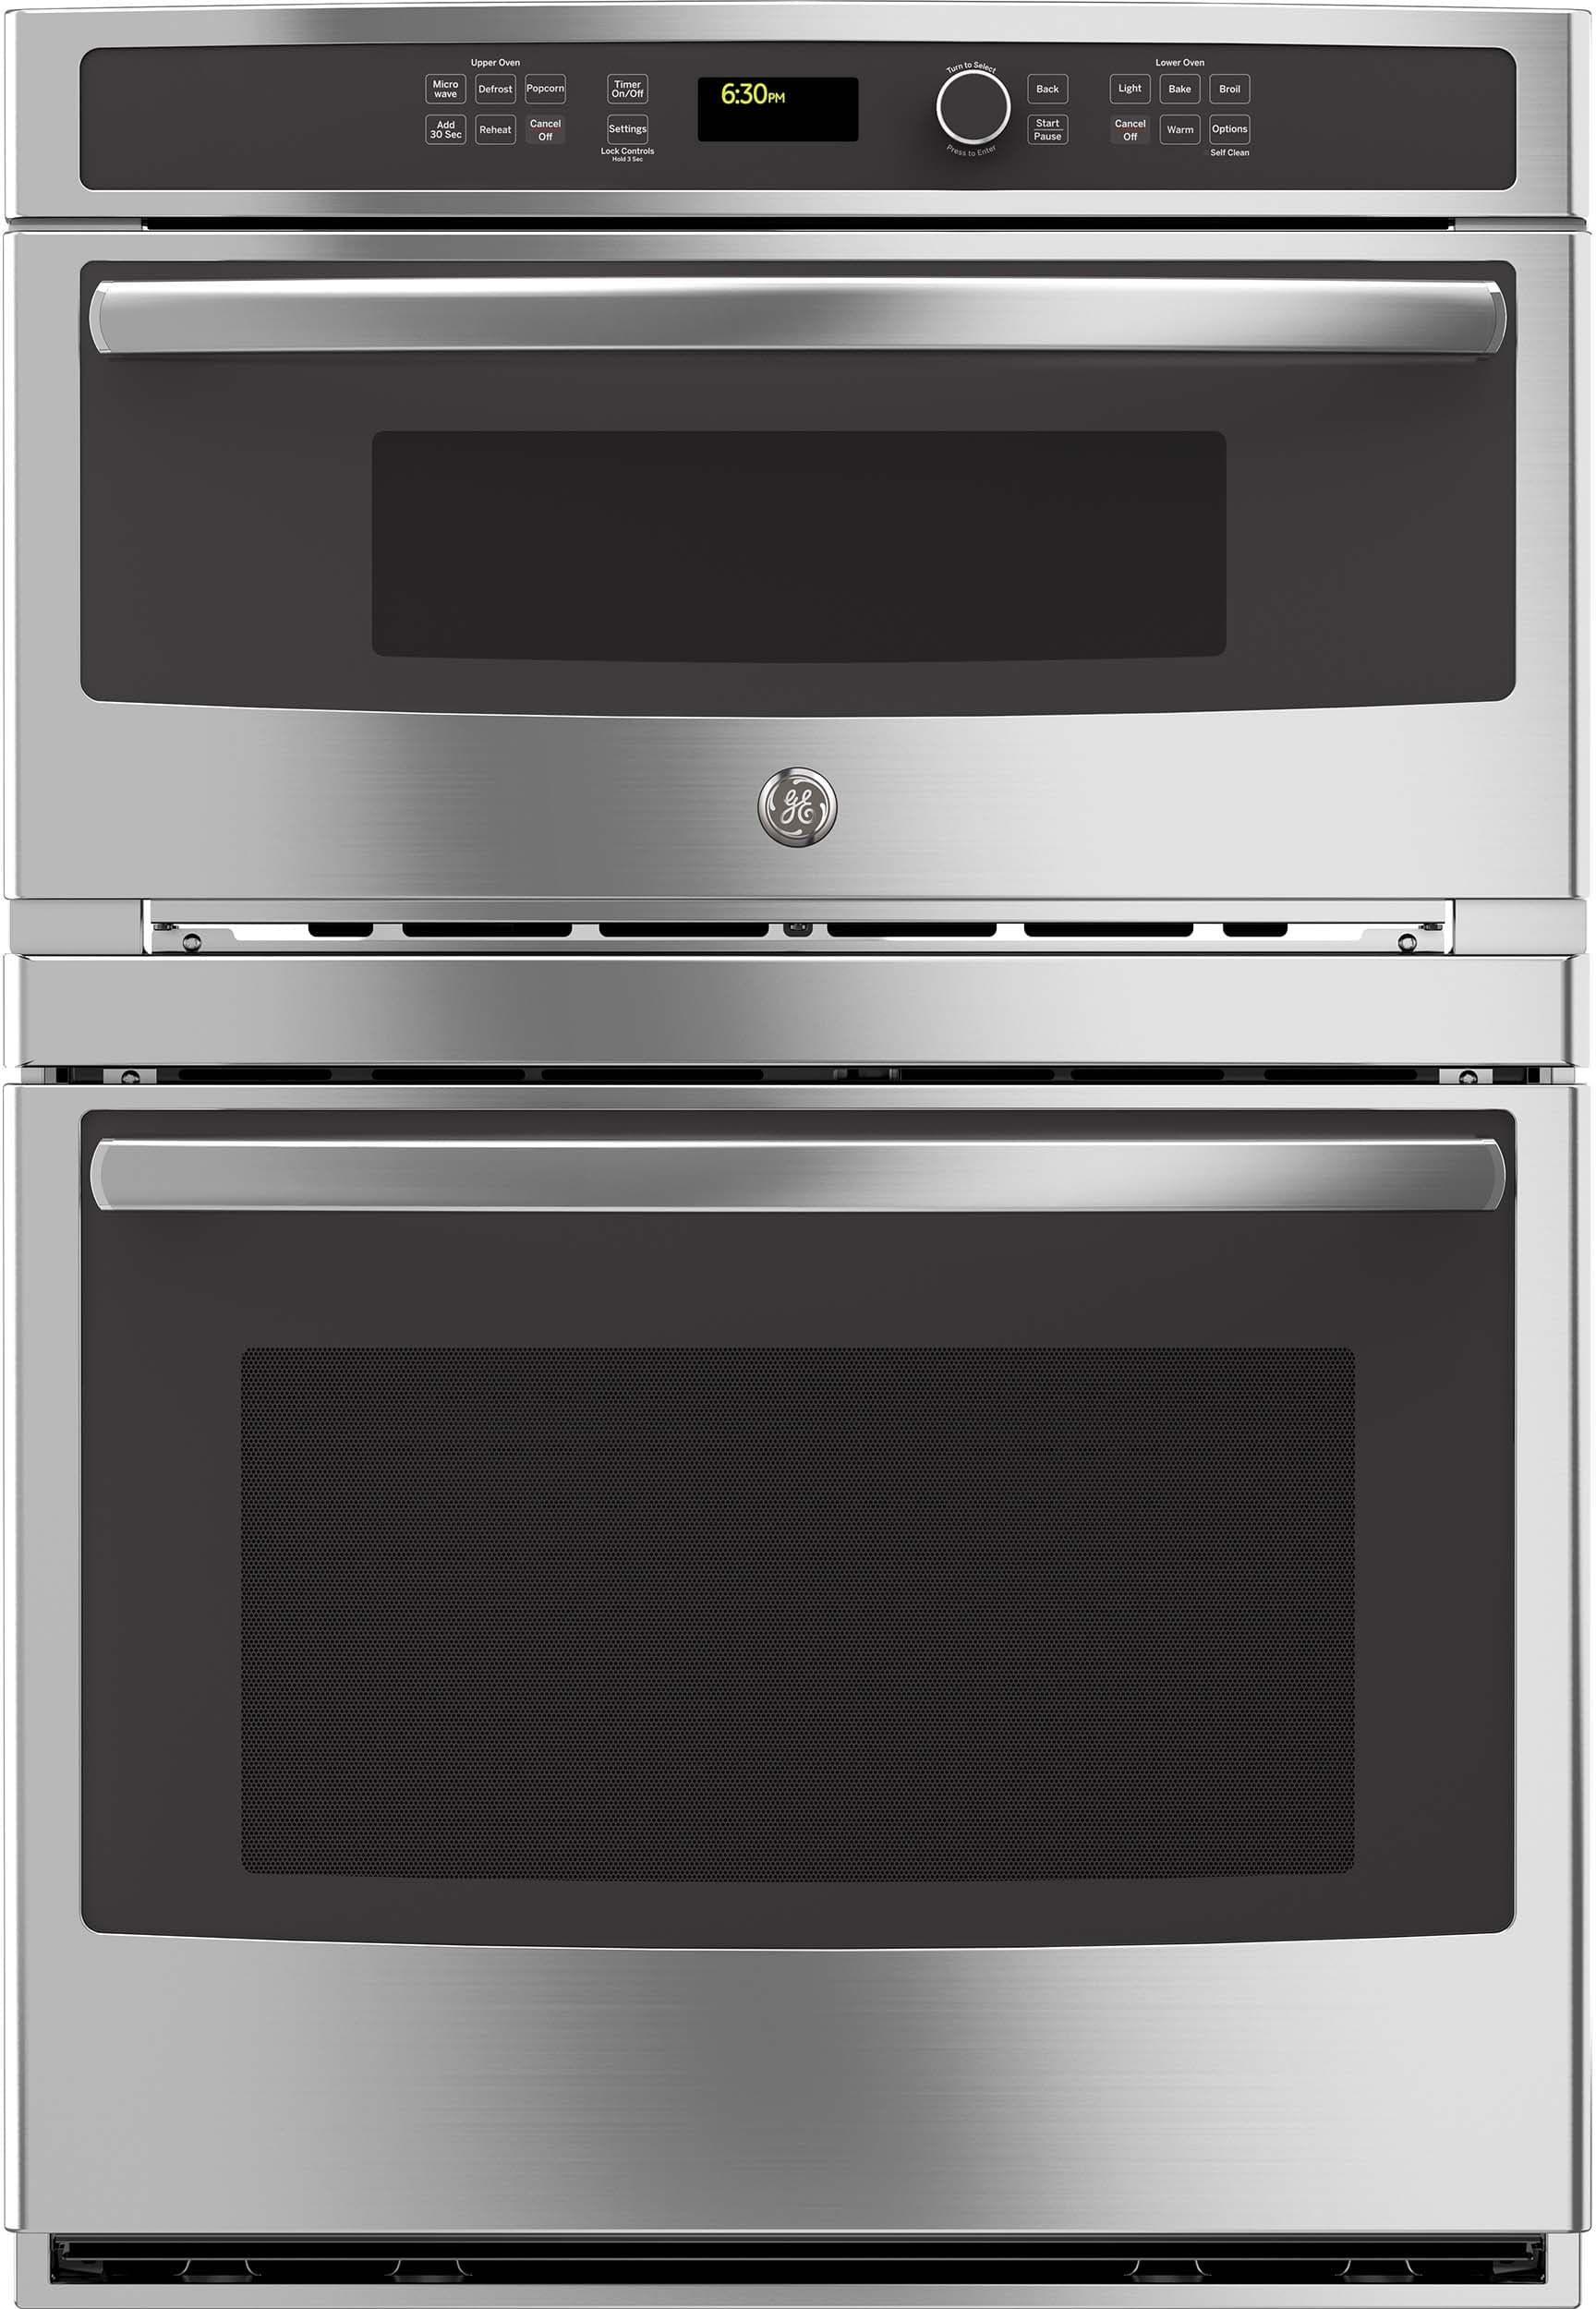 Ge Profile Pt7800ekes Wall Oven Single Wall Oven Microwave Oven